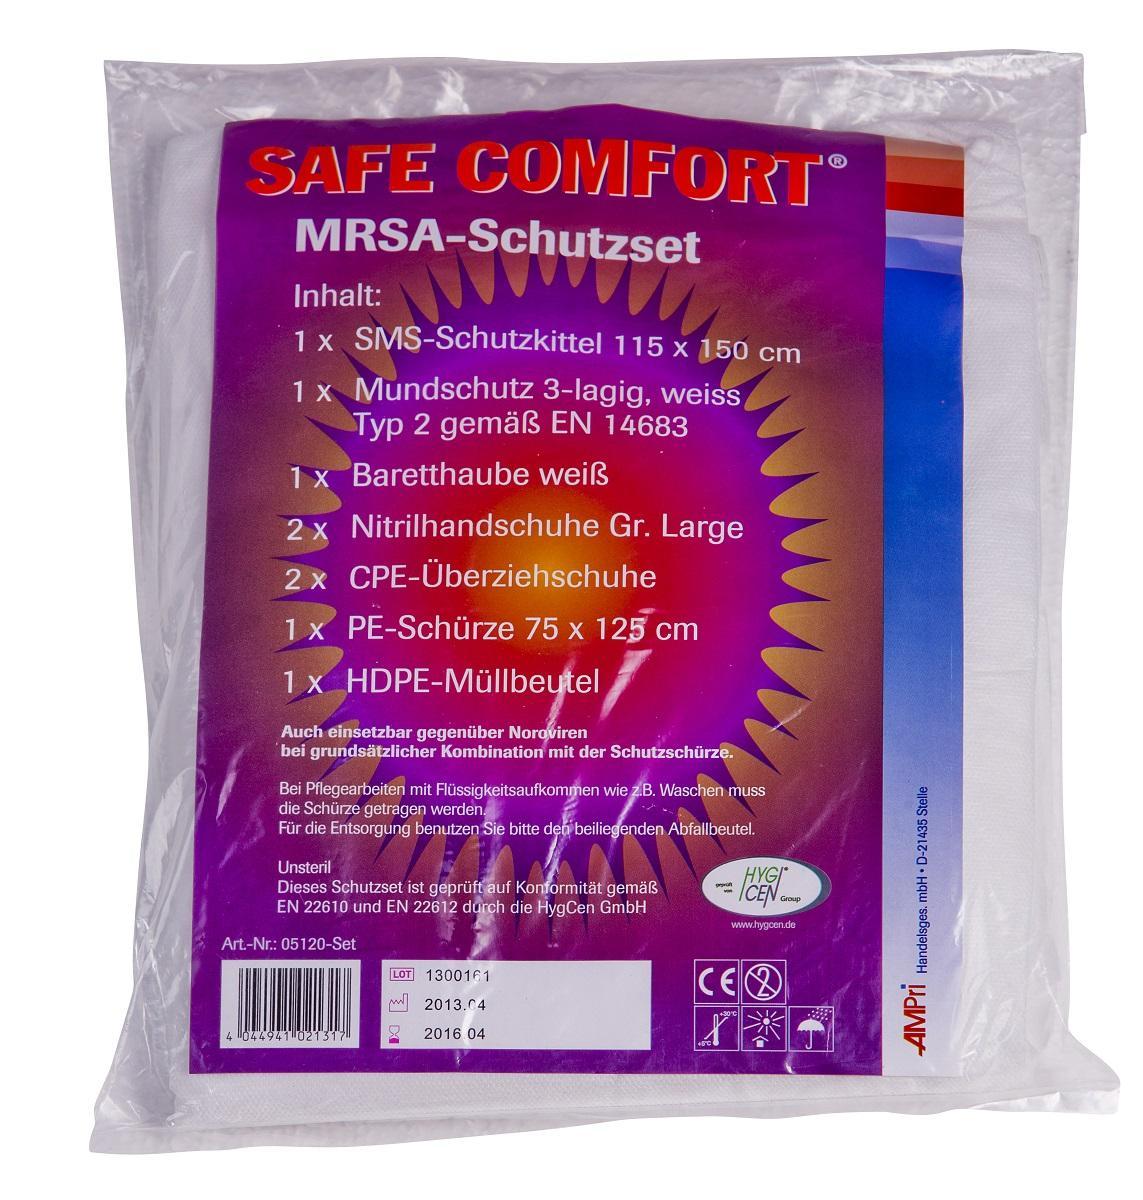 Safe Comfort MRSA-Schutzset